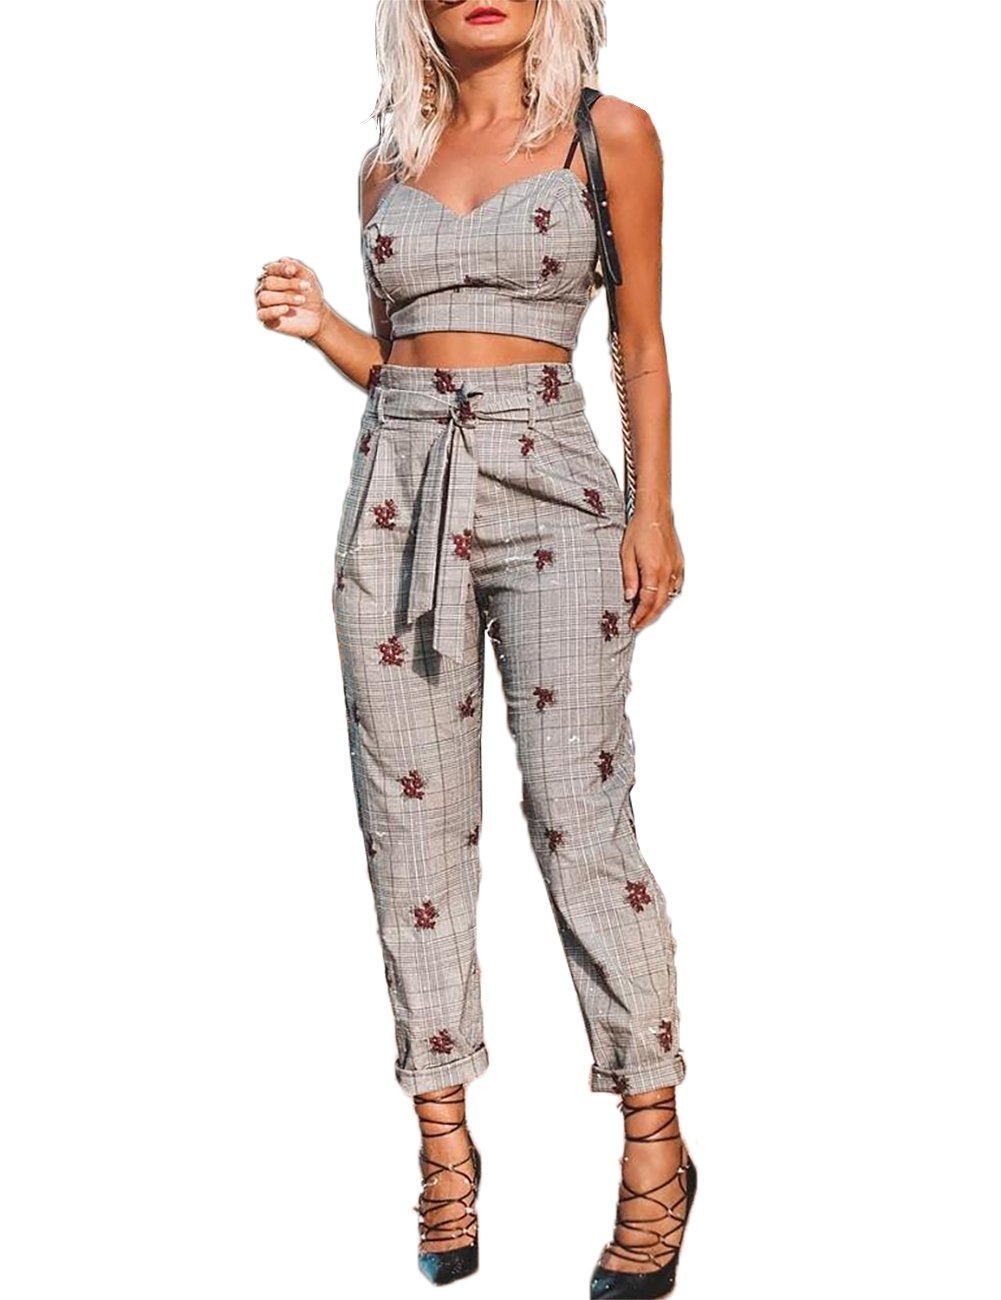 Senggeruida WomenGrid Cami Top & Self Belted Pant Set Grey M